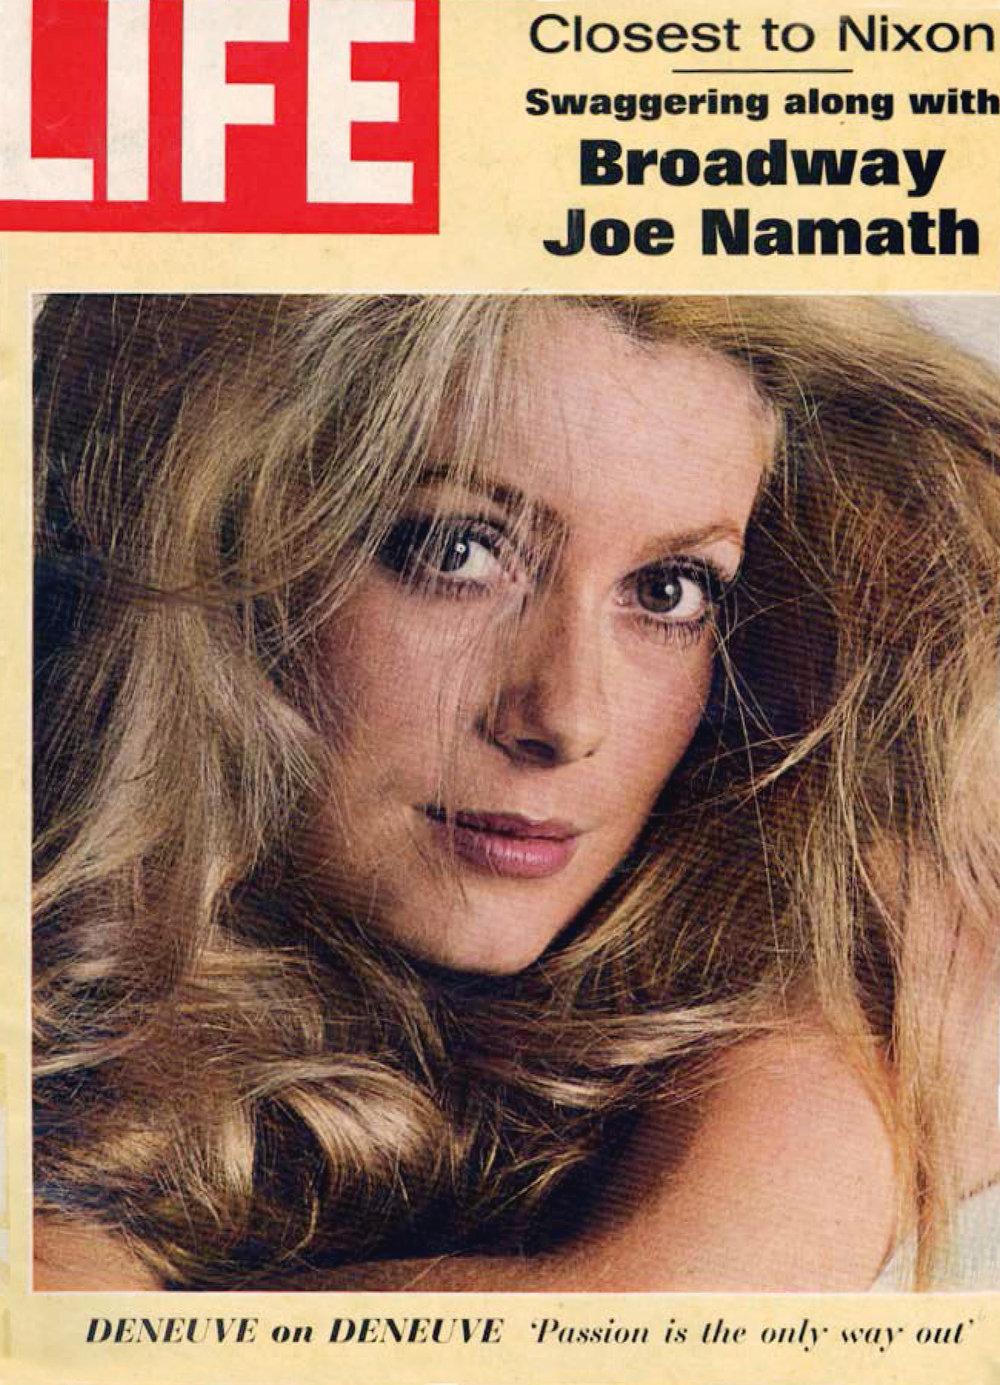 LIFE,January 1969